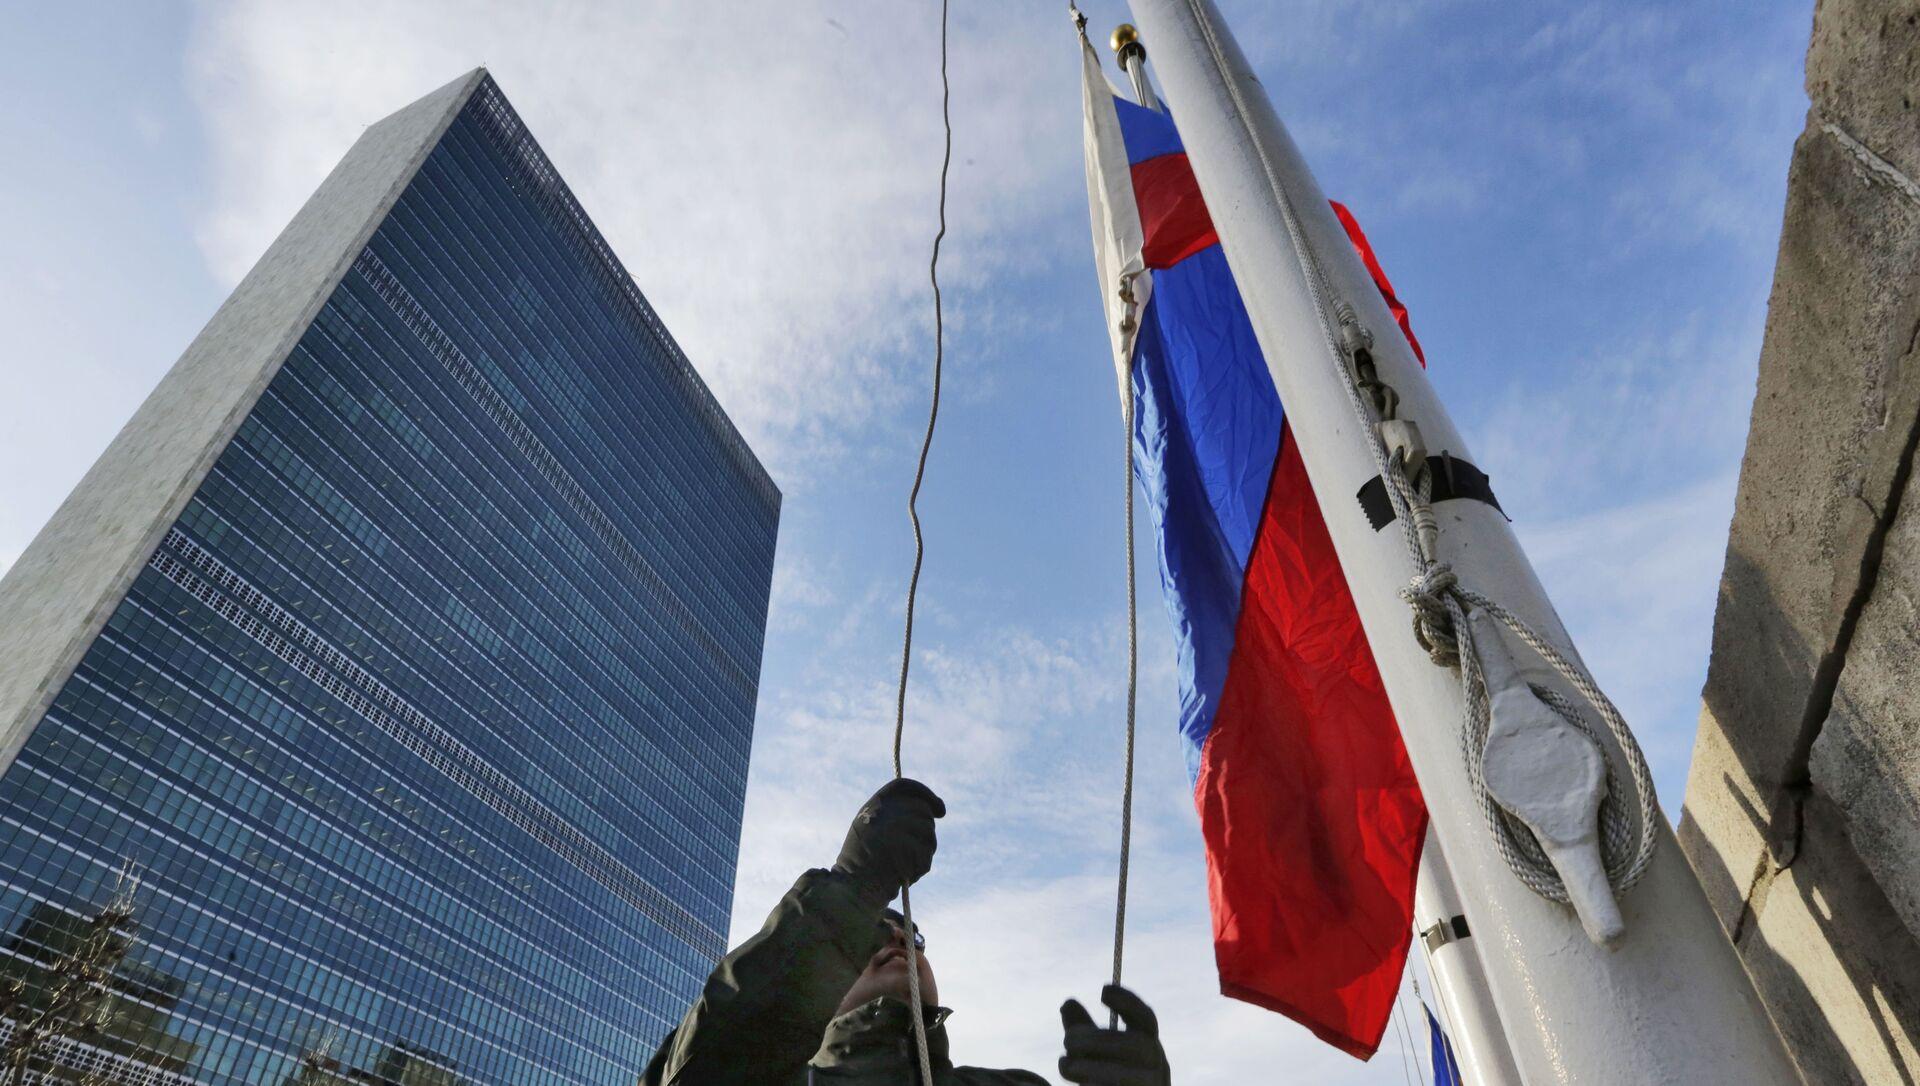 A United Nations security officer raises the Russian flag outside U.N. headquarters, Tuesday morning, Feb. 21, 2017. - Sputnik International, 1920, 06.08.2021